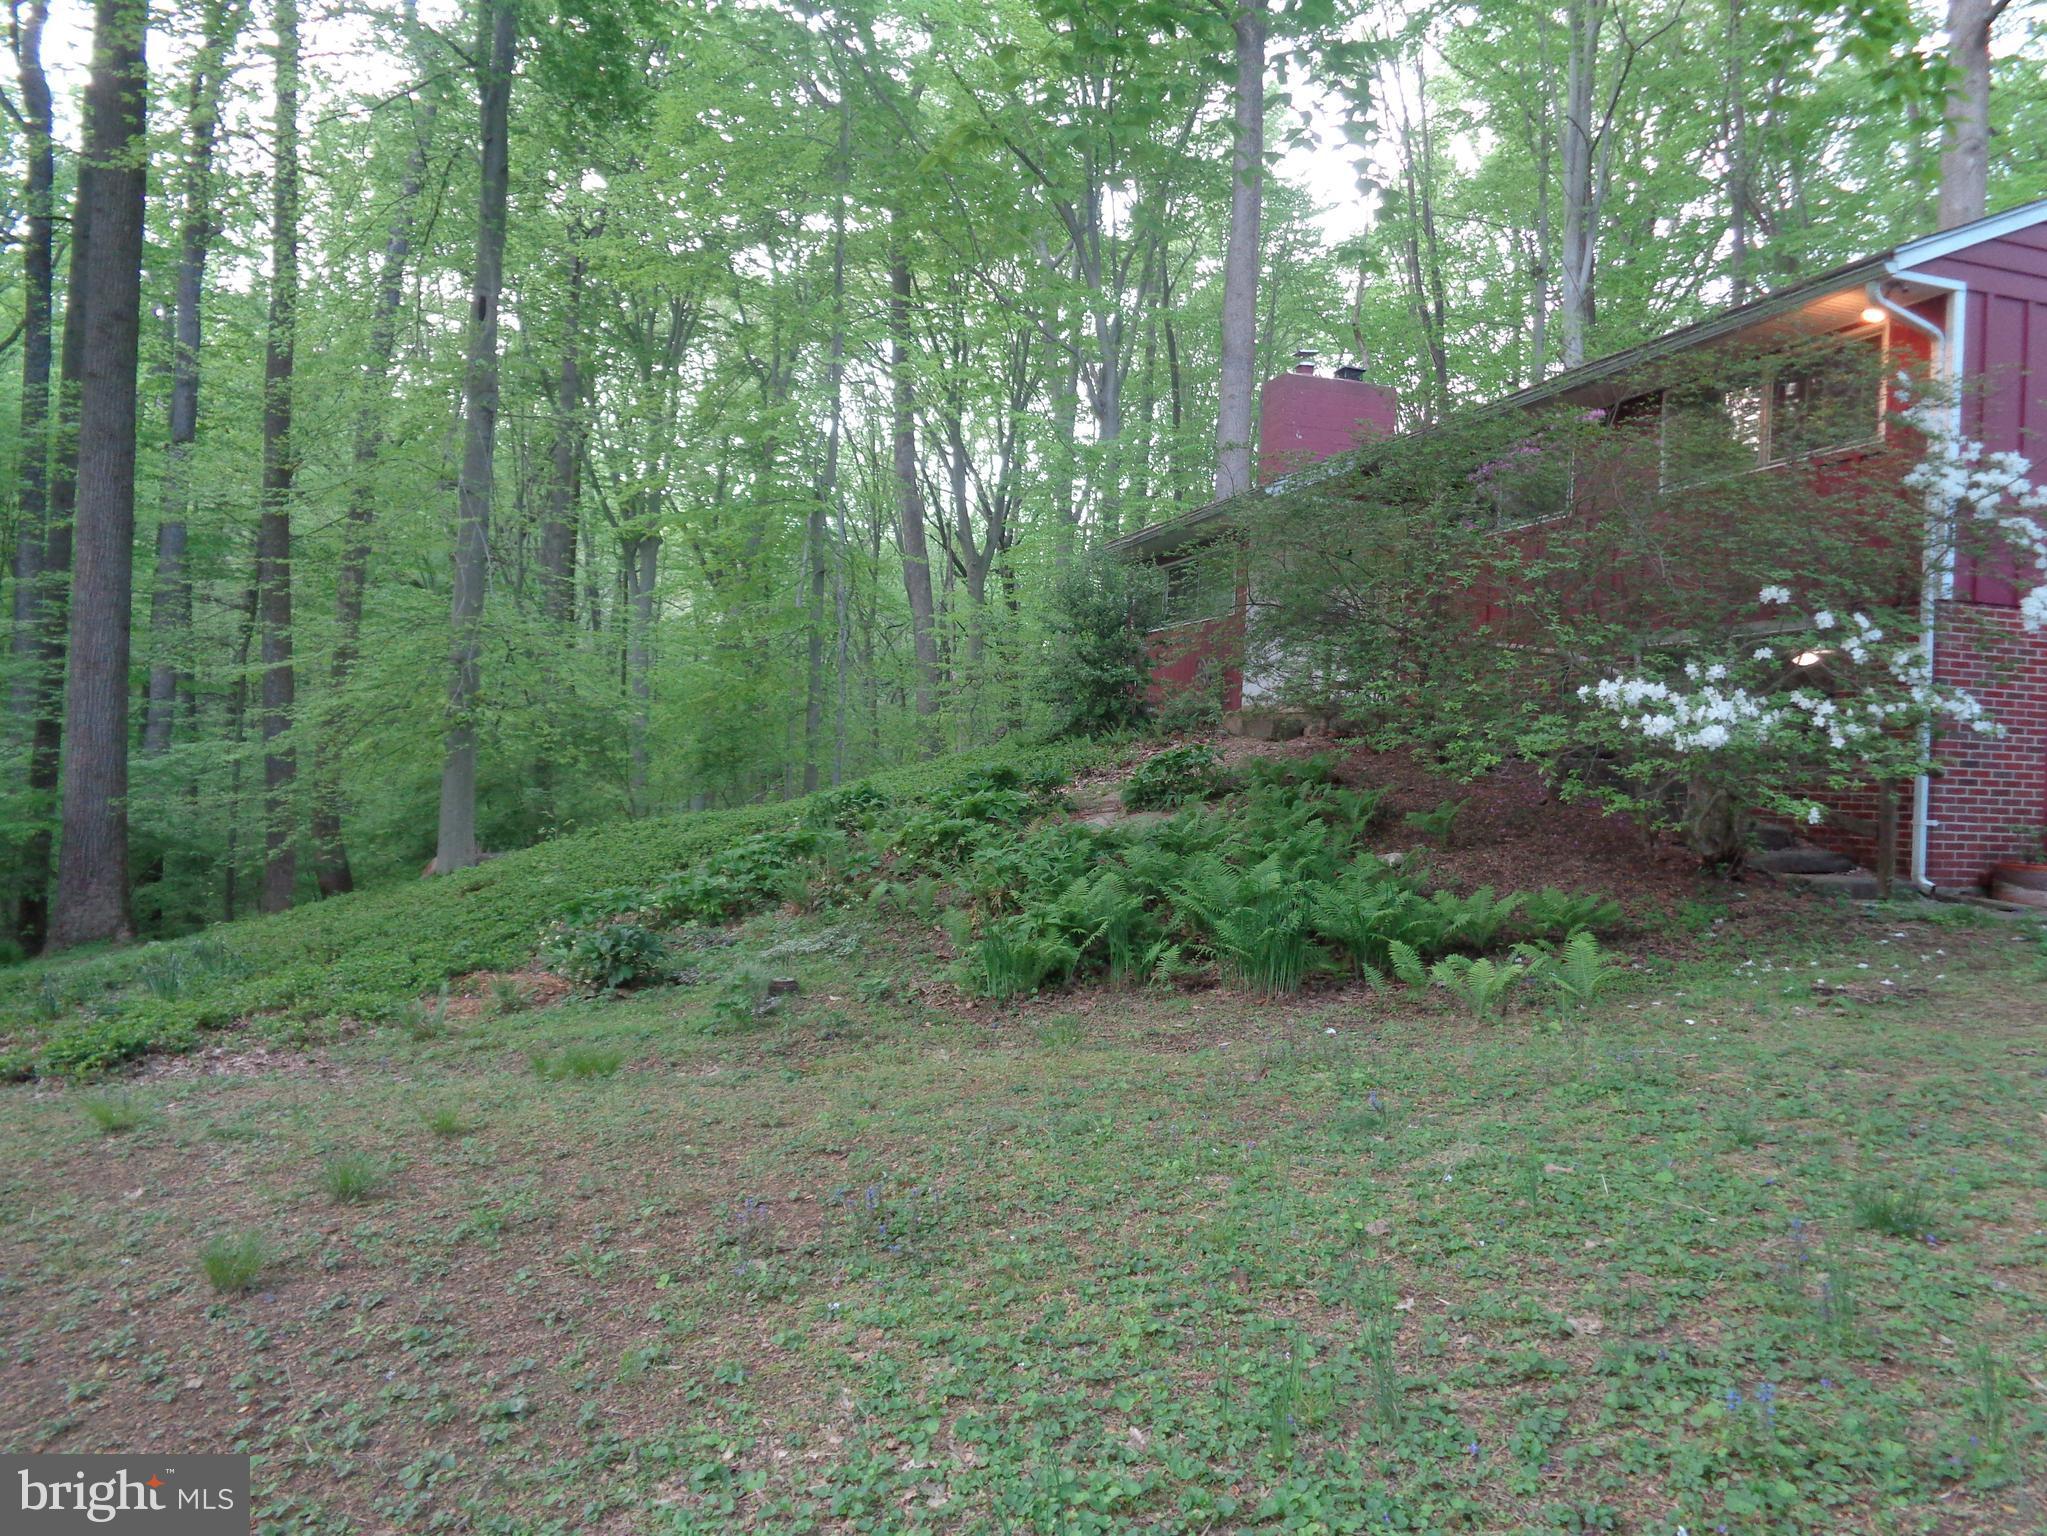 1616 DOGWOOD HILL ROAD, TOWSON, MD 21286